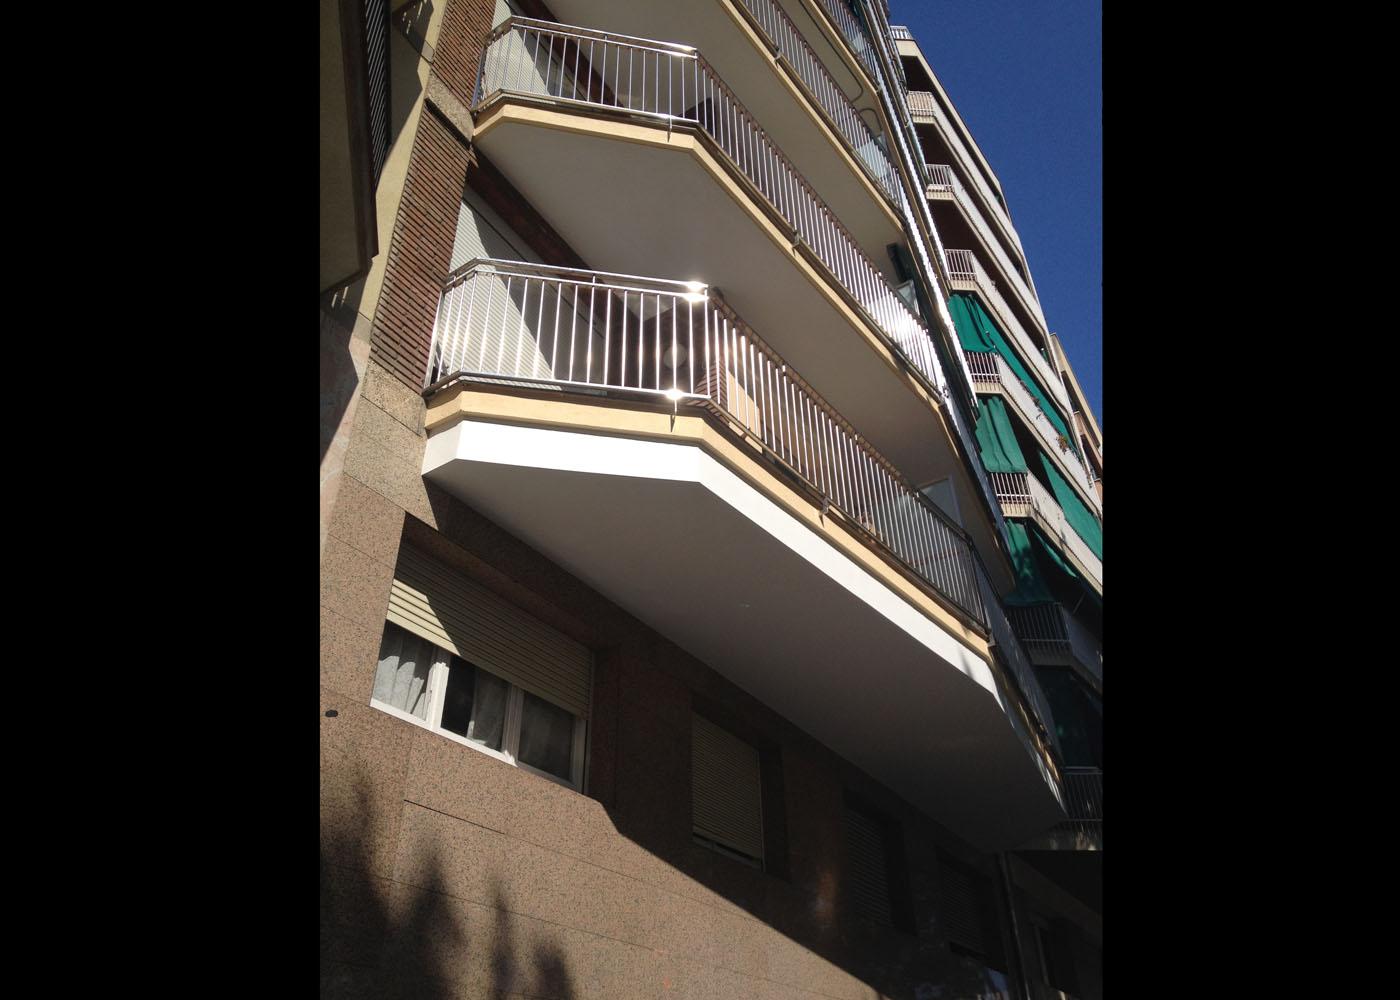 rehabilitacion-vivienda-plurifamiliar-passeig-de-lluis-companys-6-barcelona-01